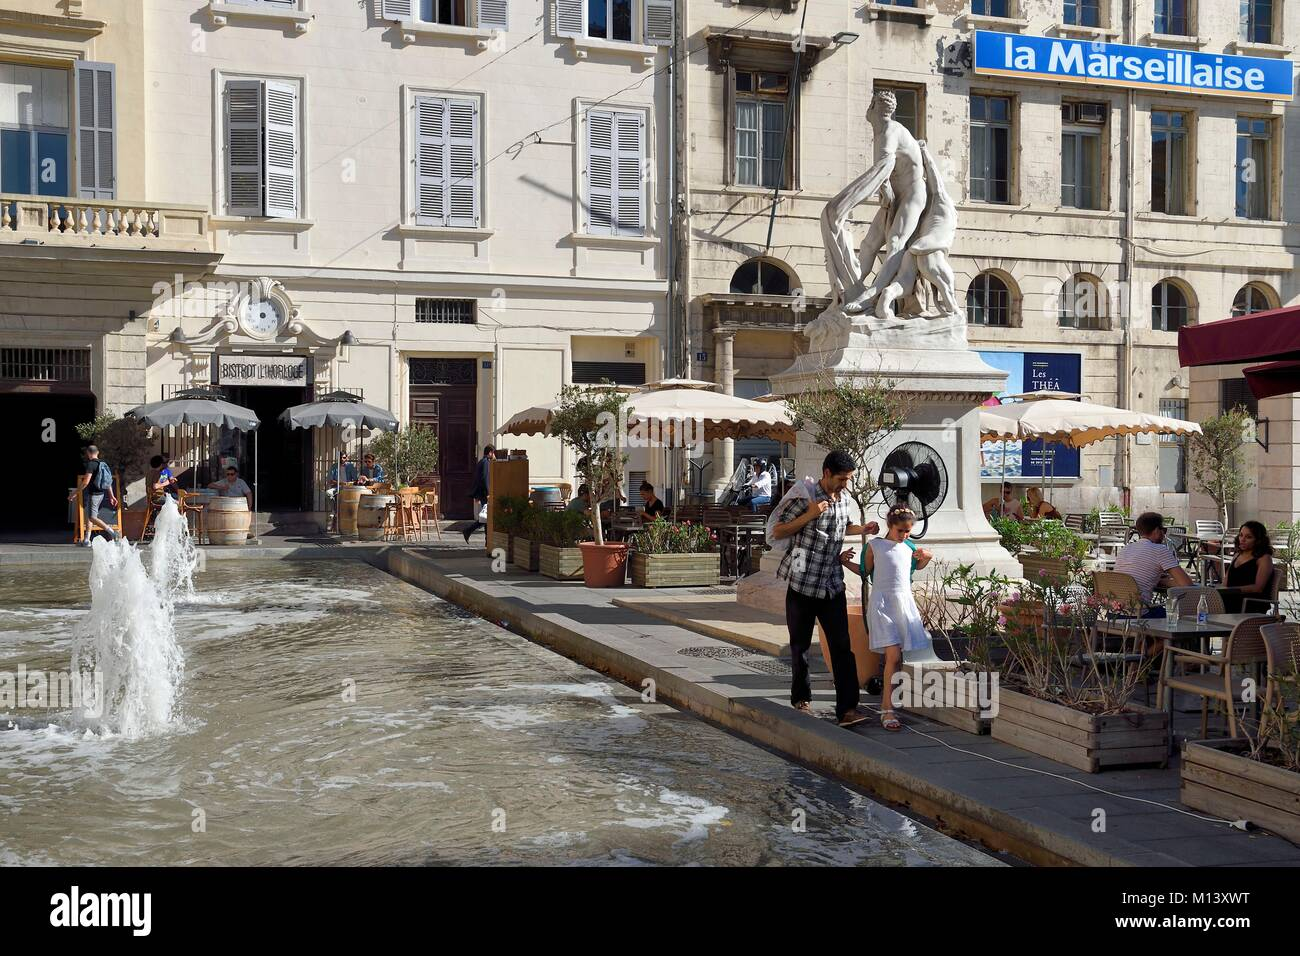 France, Bouches du Rhone, Marseille, le cours Estienne d'Orves, basin and headquarters of the newspaper La Marseillaise - Stock Image